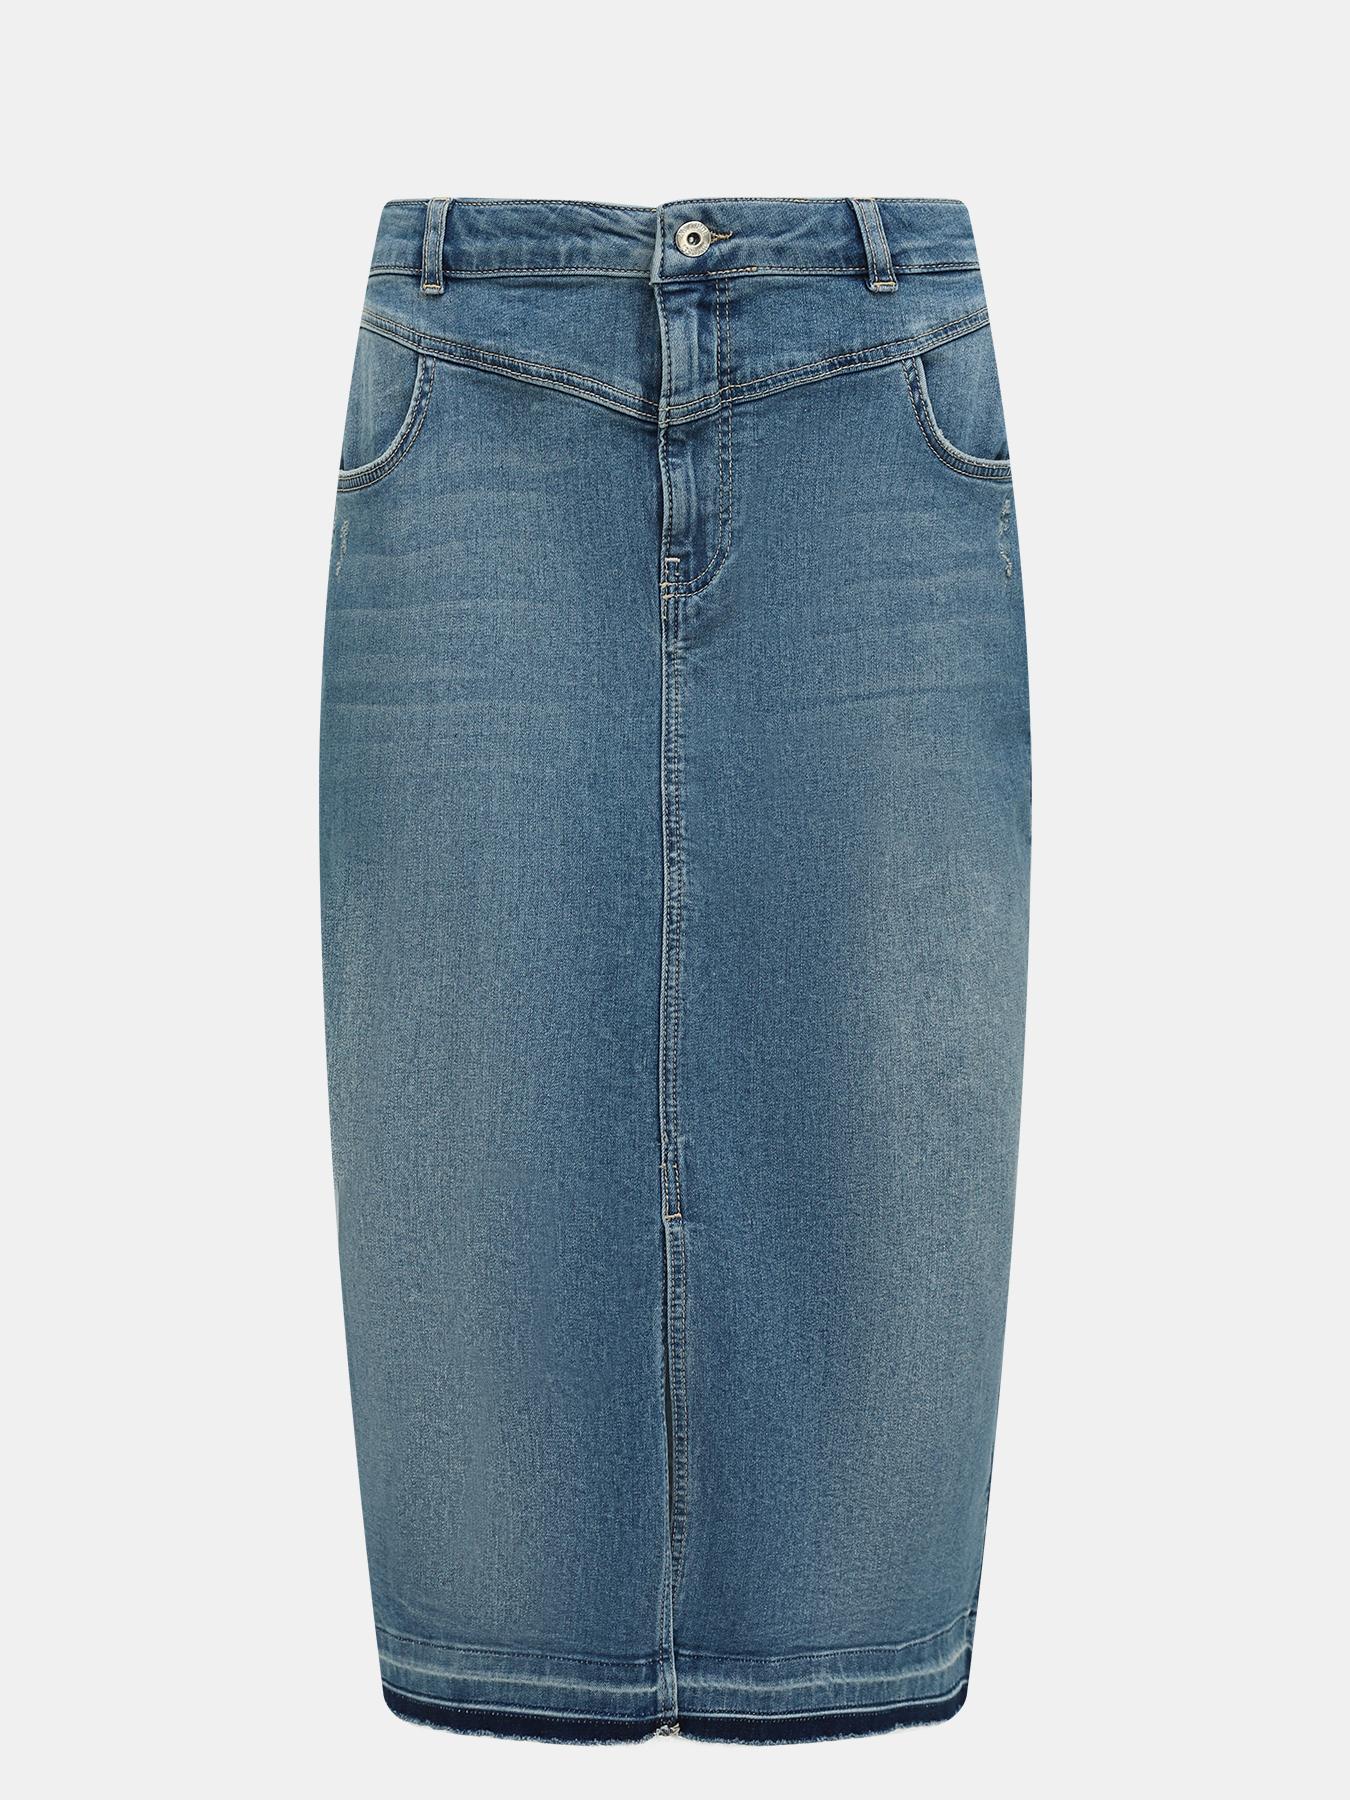 2nd day джинсовая юбка Юбки TWINSET ACTITUDE Джинсовая юбка